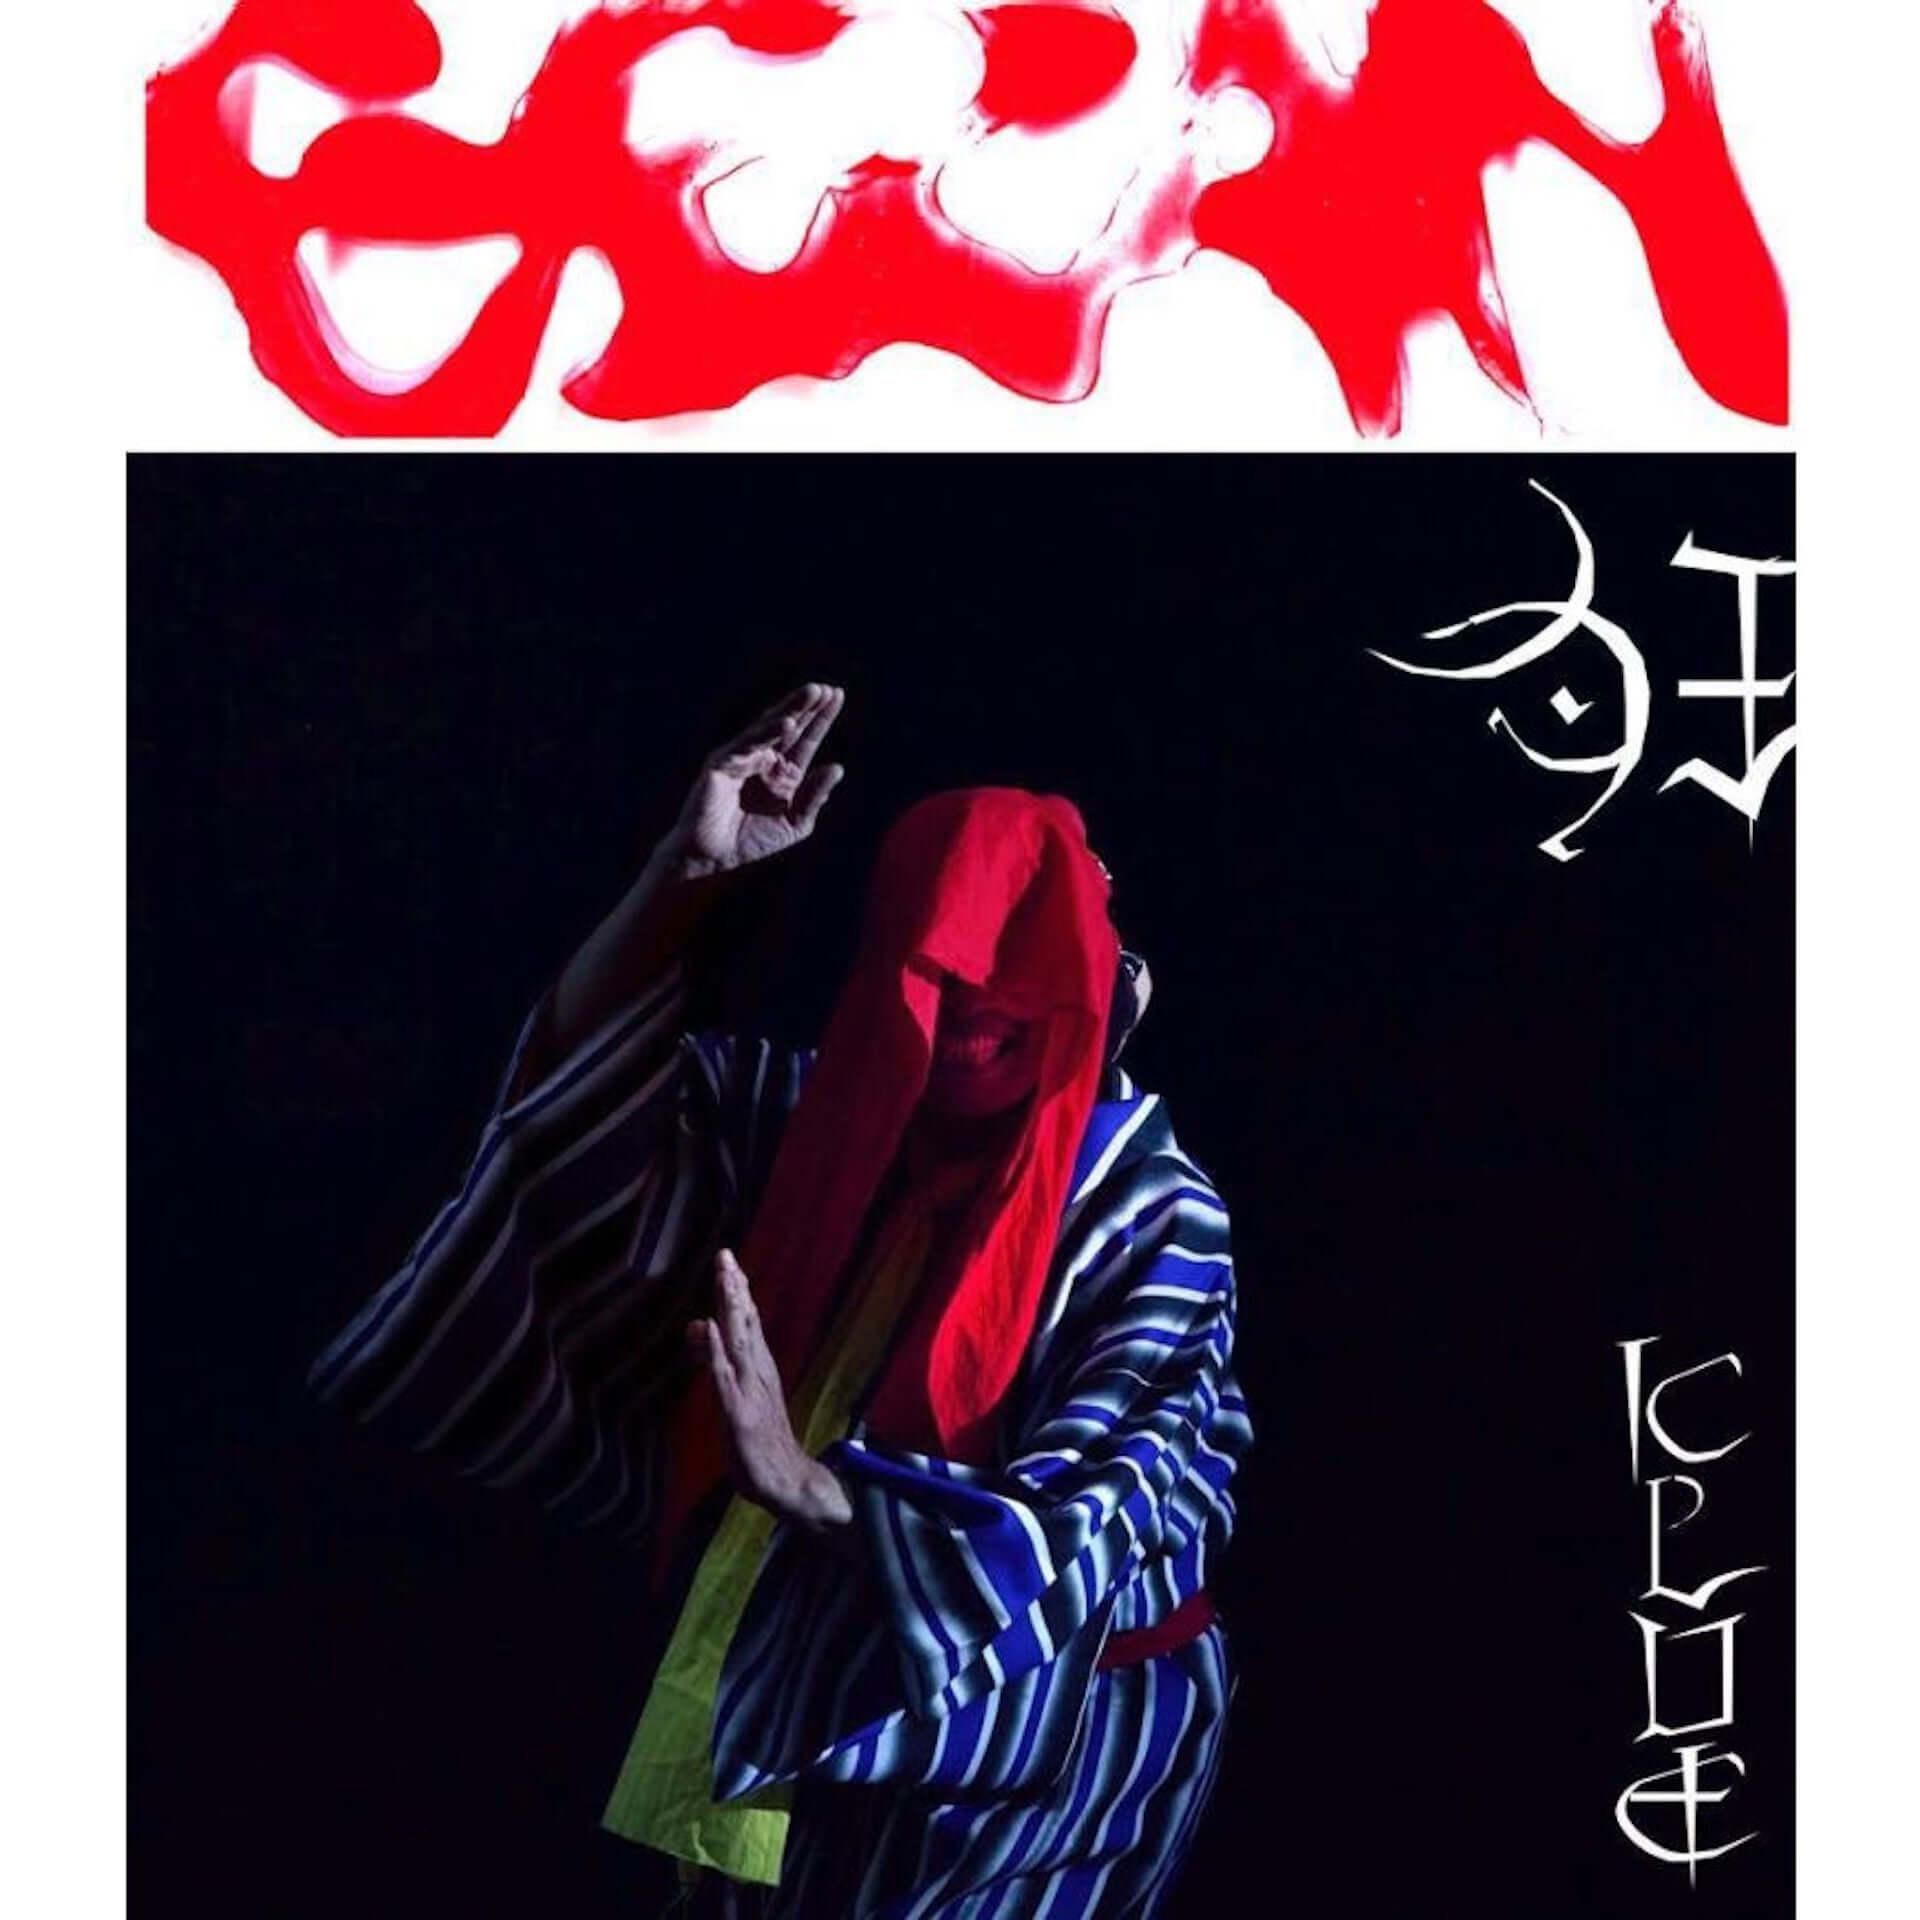 GEZAN主宰〈十三月〉の公式グッズや限定LPがGAN-BAN店頭で販売開始!マヒトゥ・ザ・ピーポー、NUUAMMのCDも展開 music210316_gezan_11-1920x1920